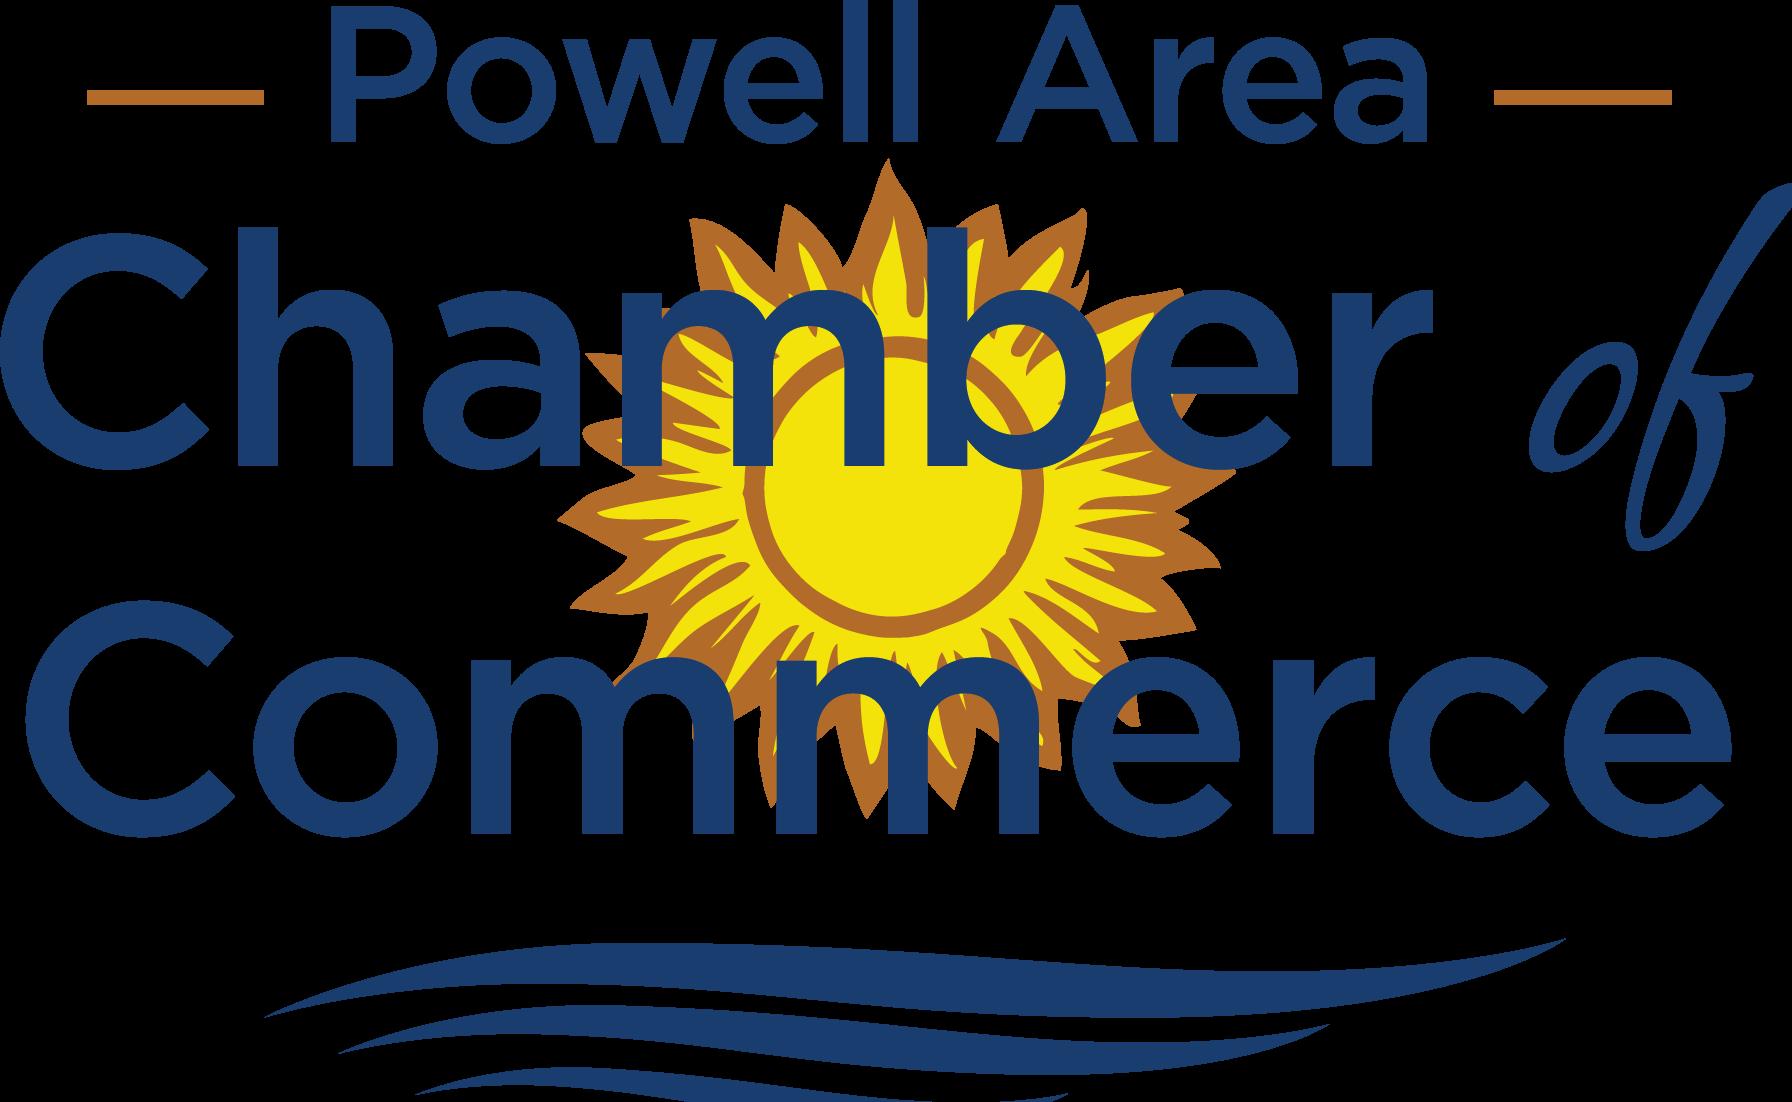 2019-new-logo-(4)ddownsiz.png